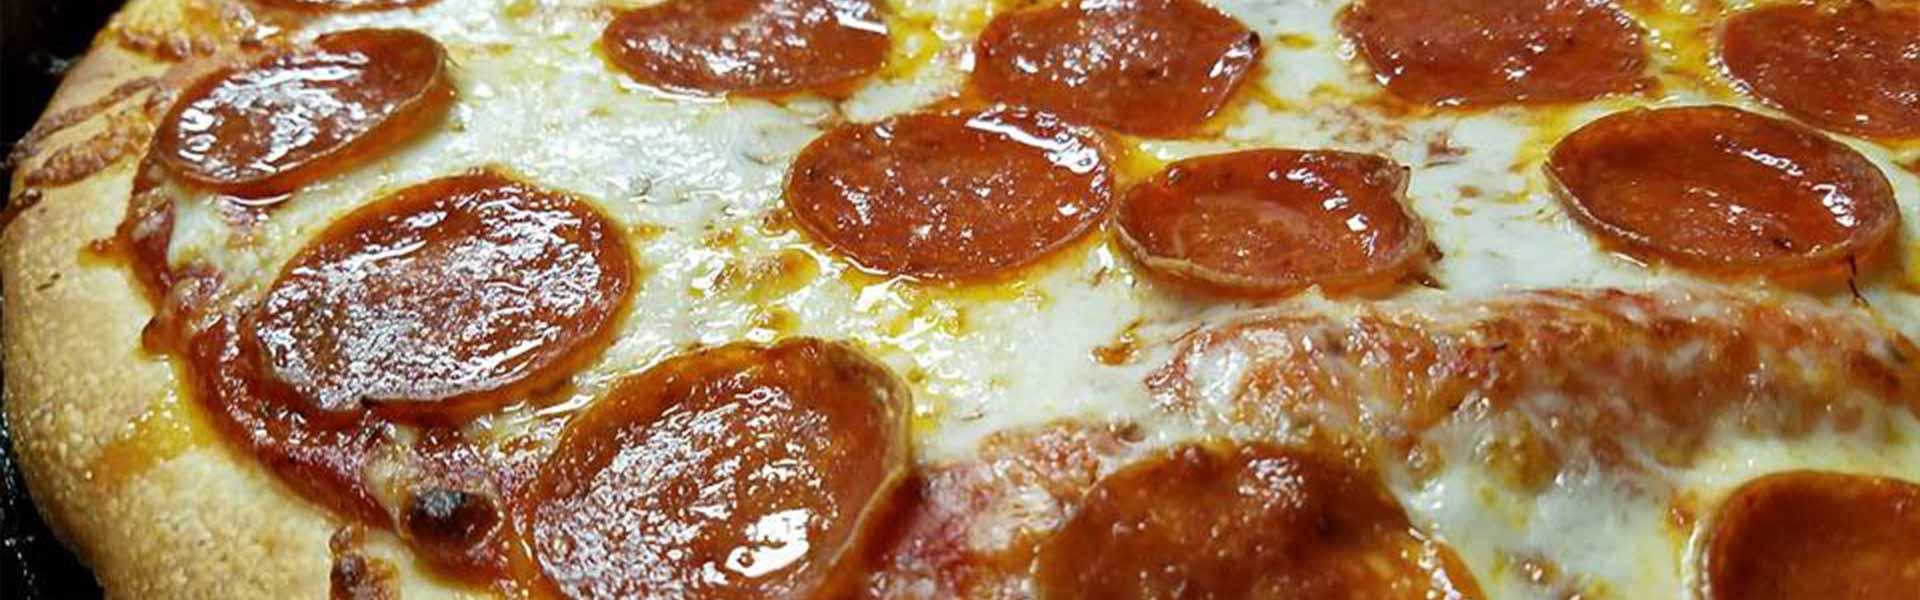 menu-trad-pizza-large